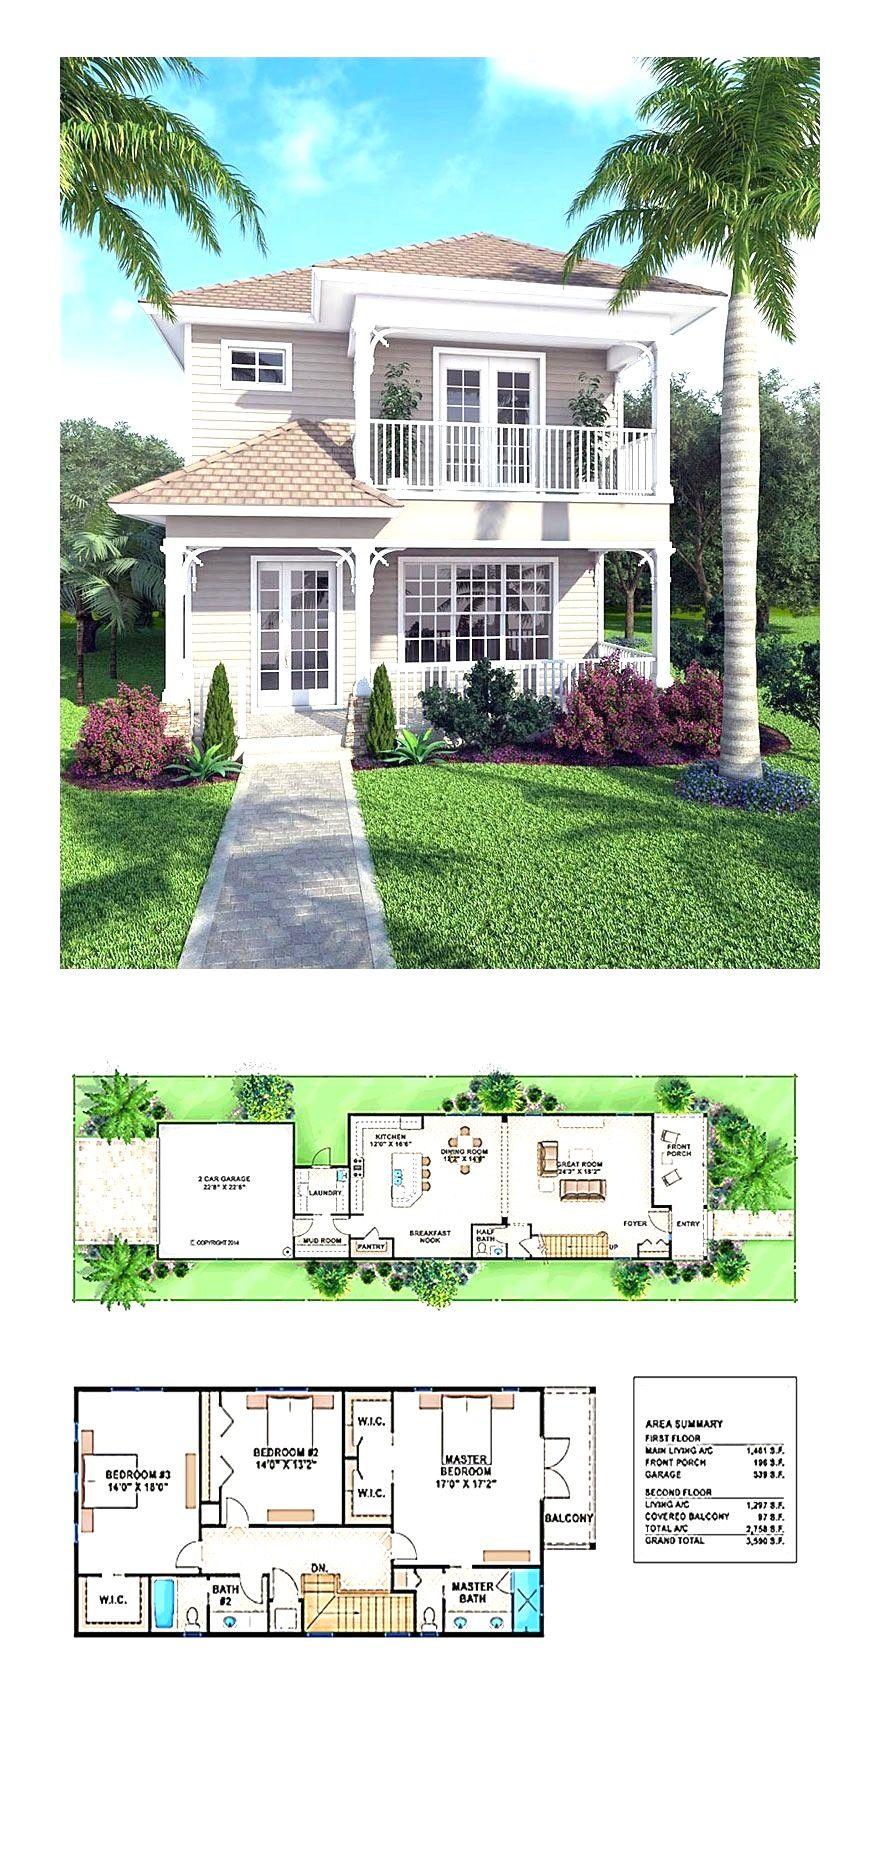 Sims 3 Spielideen Sims Haus Haus Plane Haus Grundriss